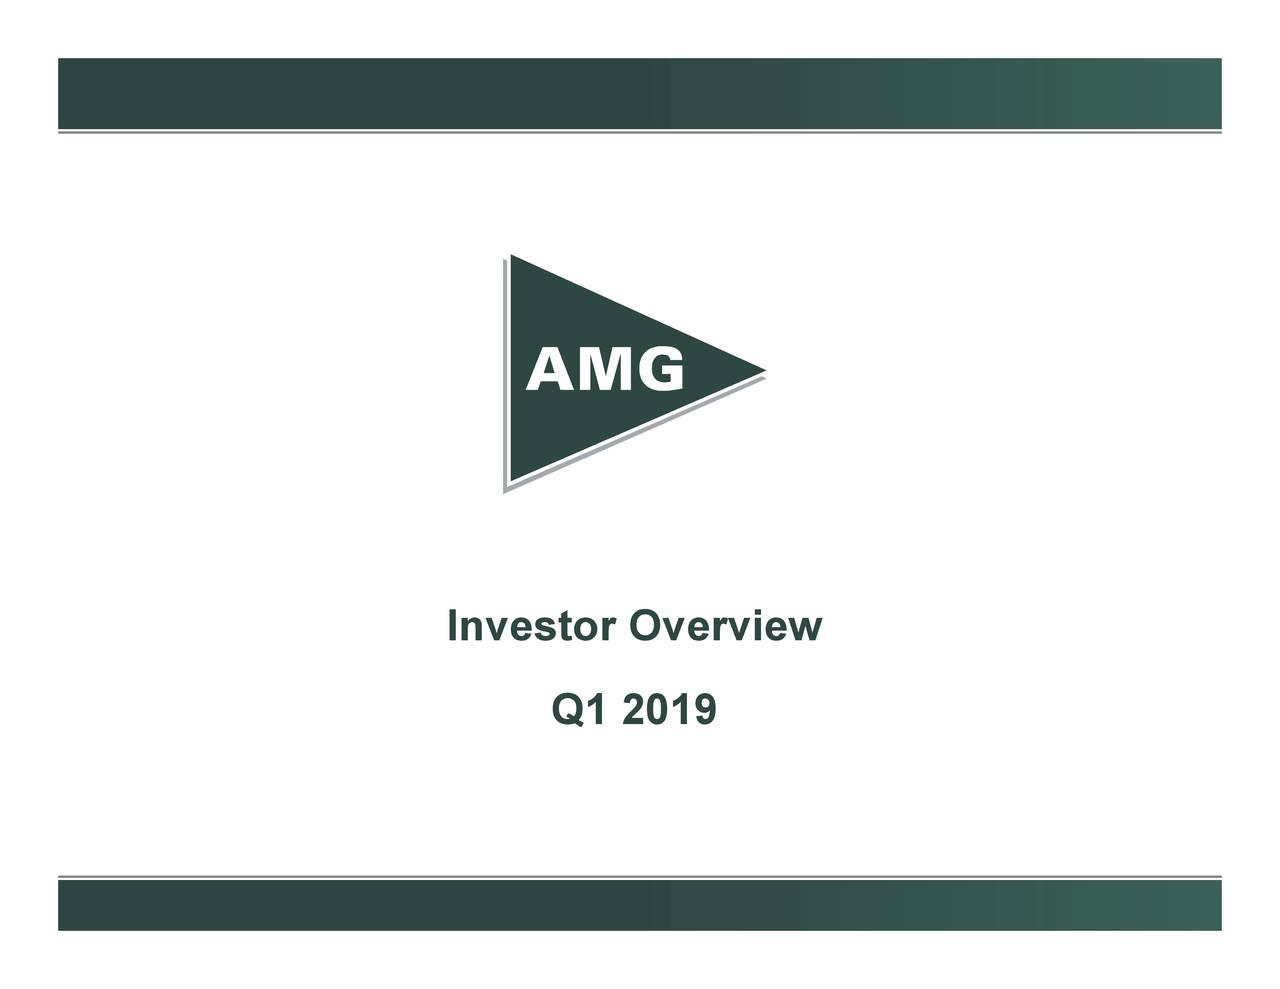 Affiliated Managers Group (AMG) Investor Presentation - Slideshow